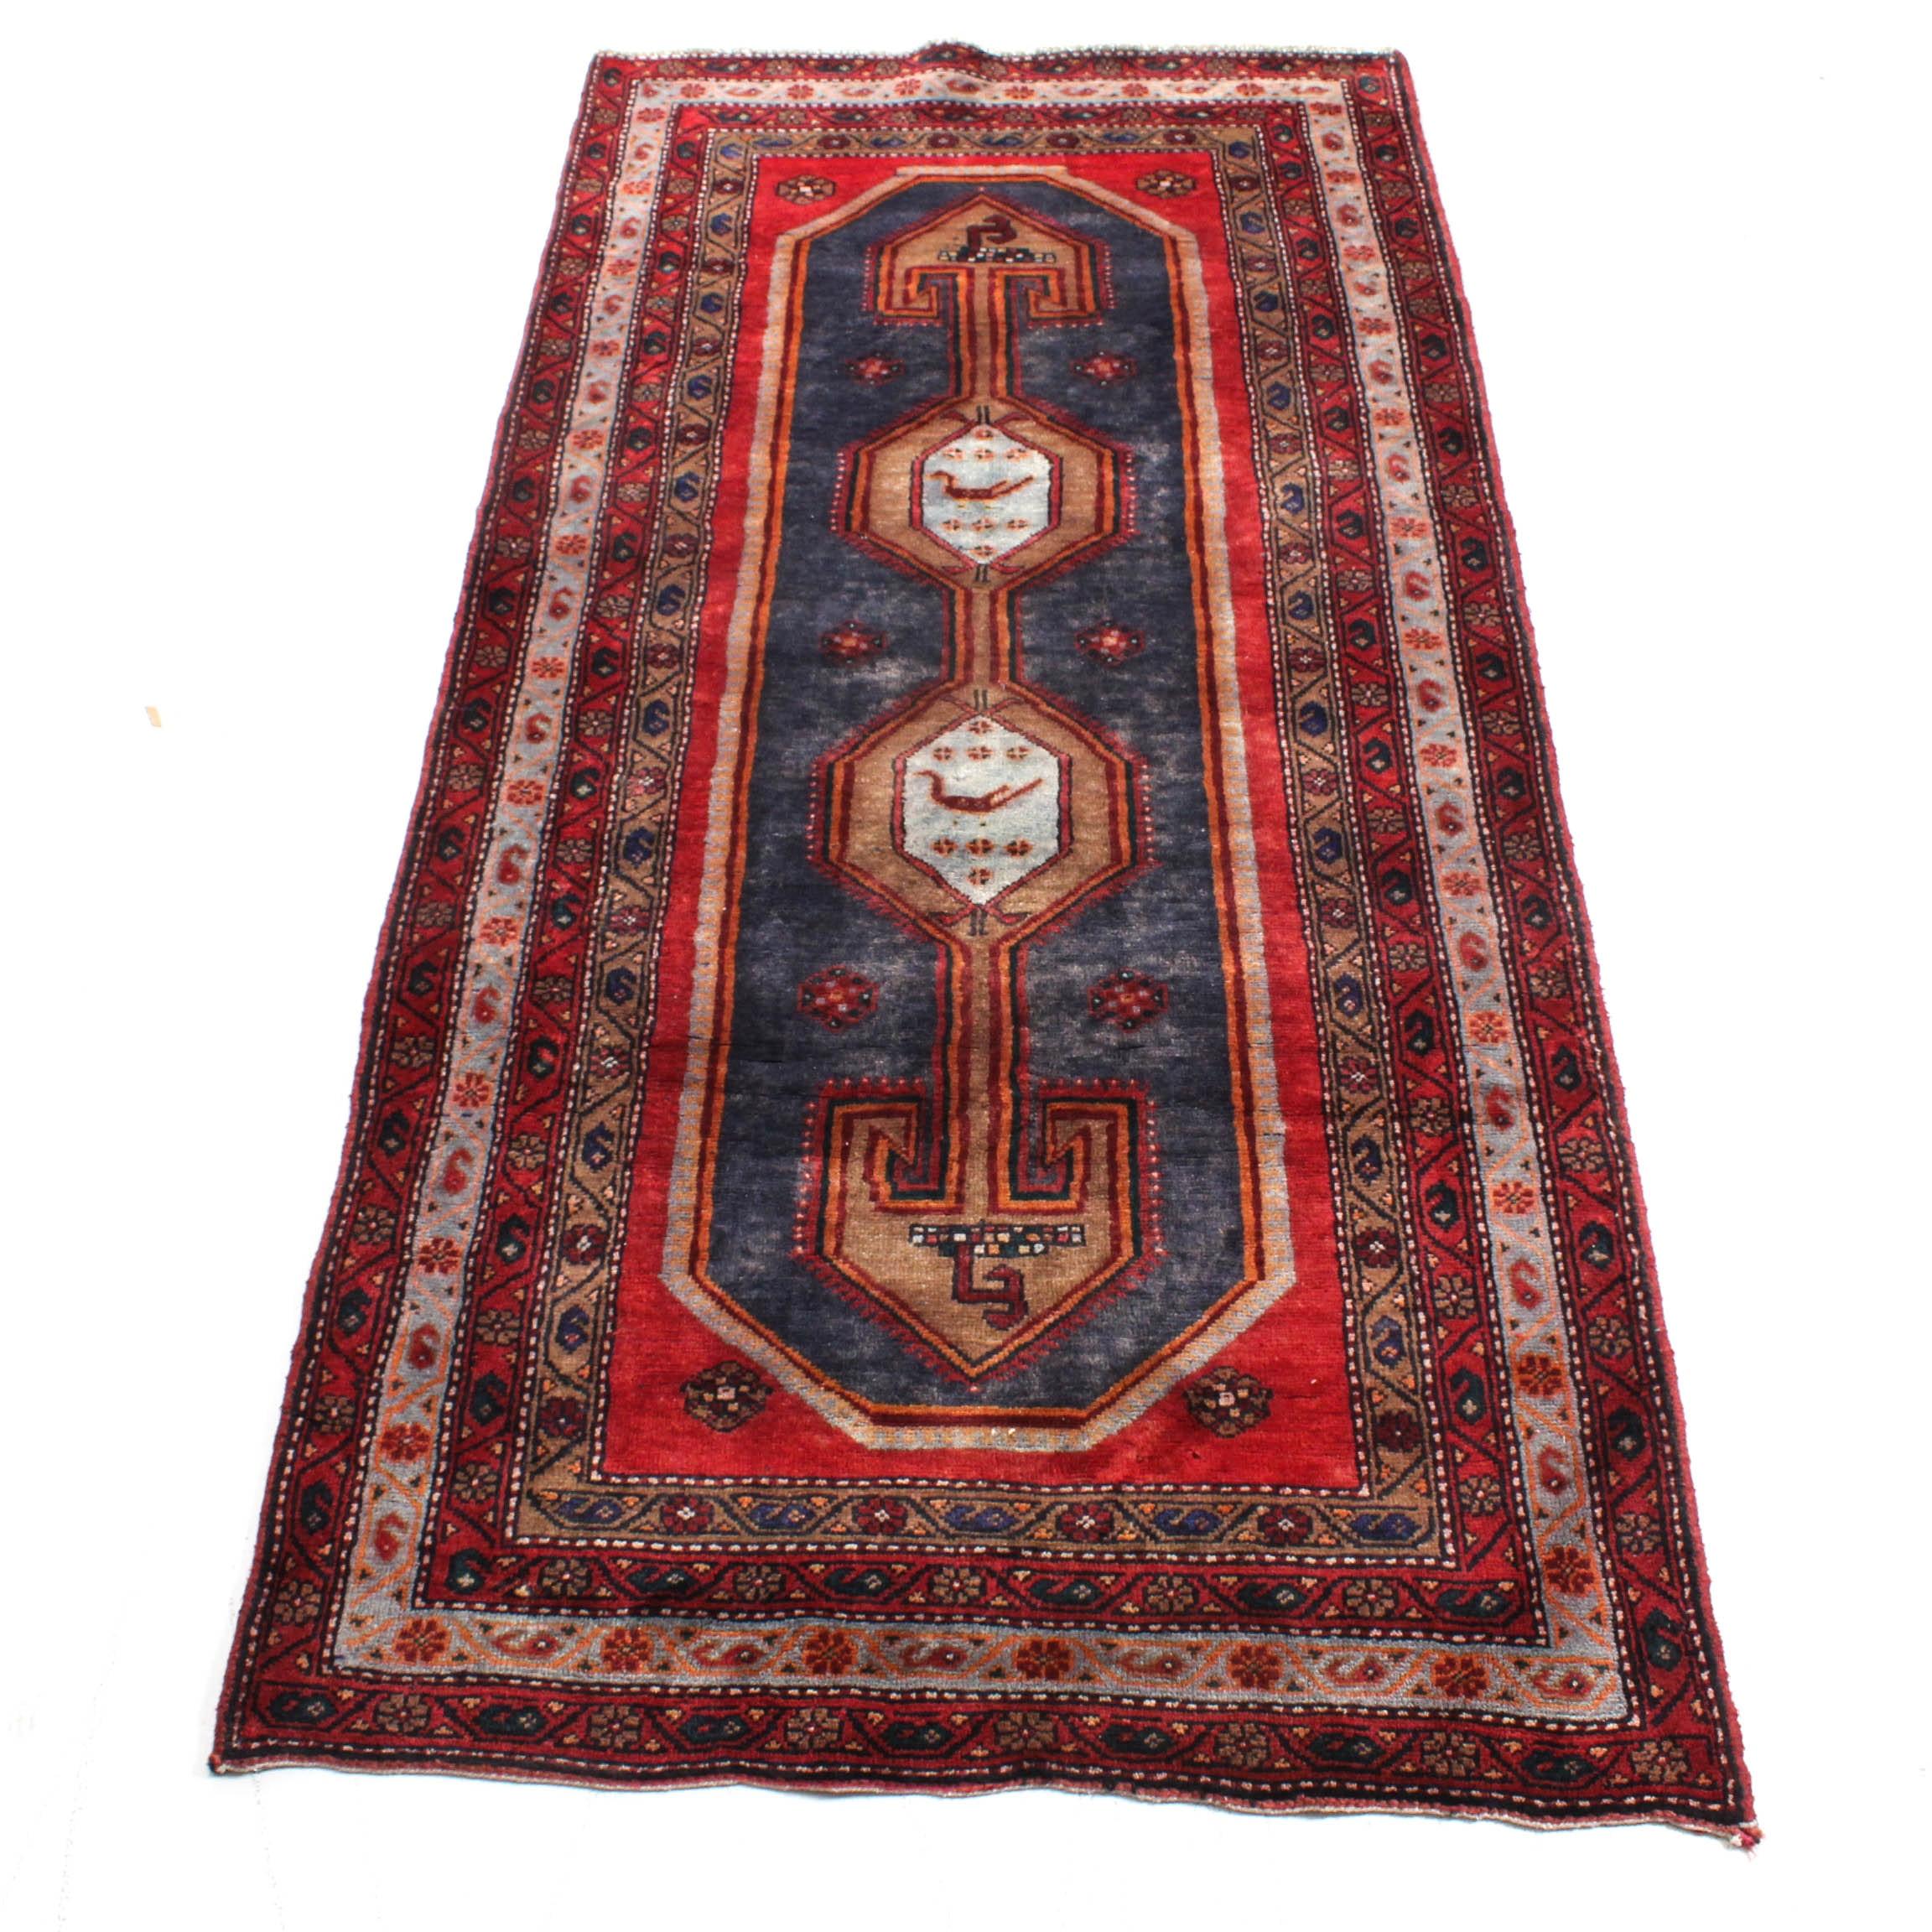 Vintage Hand-Knotted Persian Bijar Rug